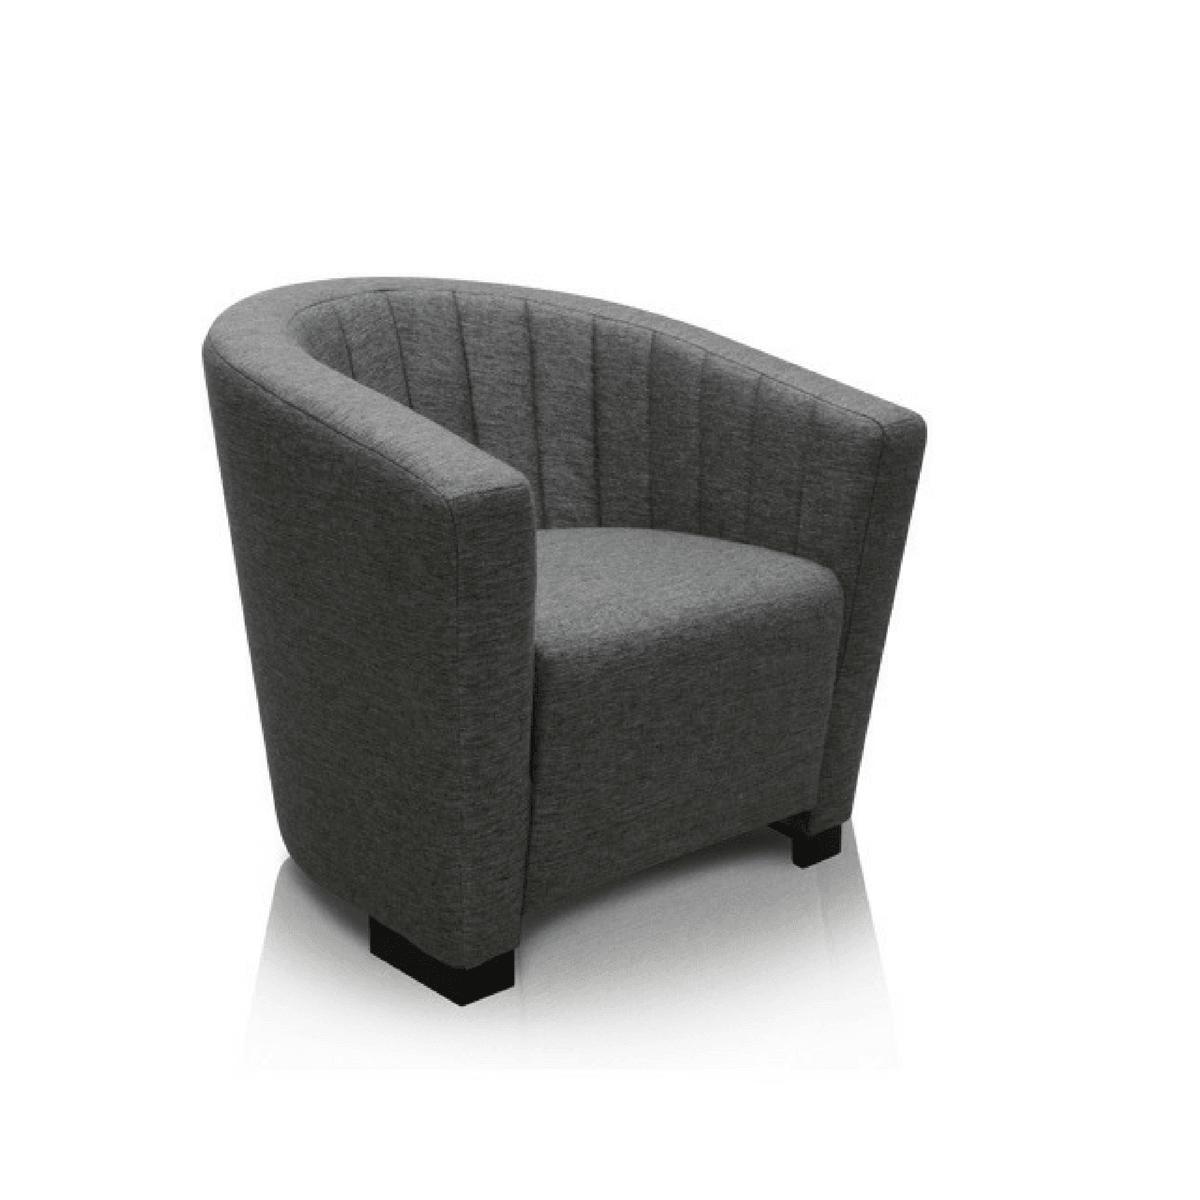 Lambe Chair